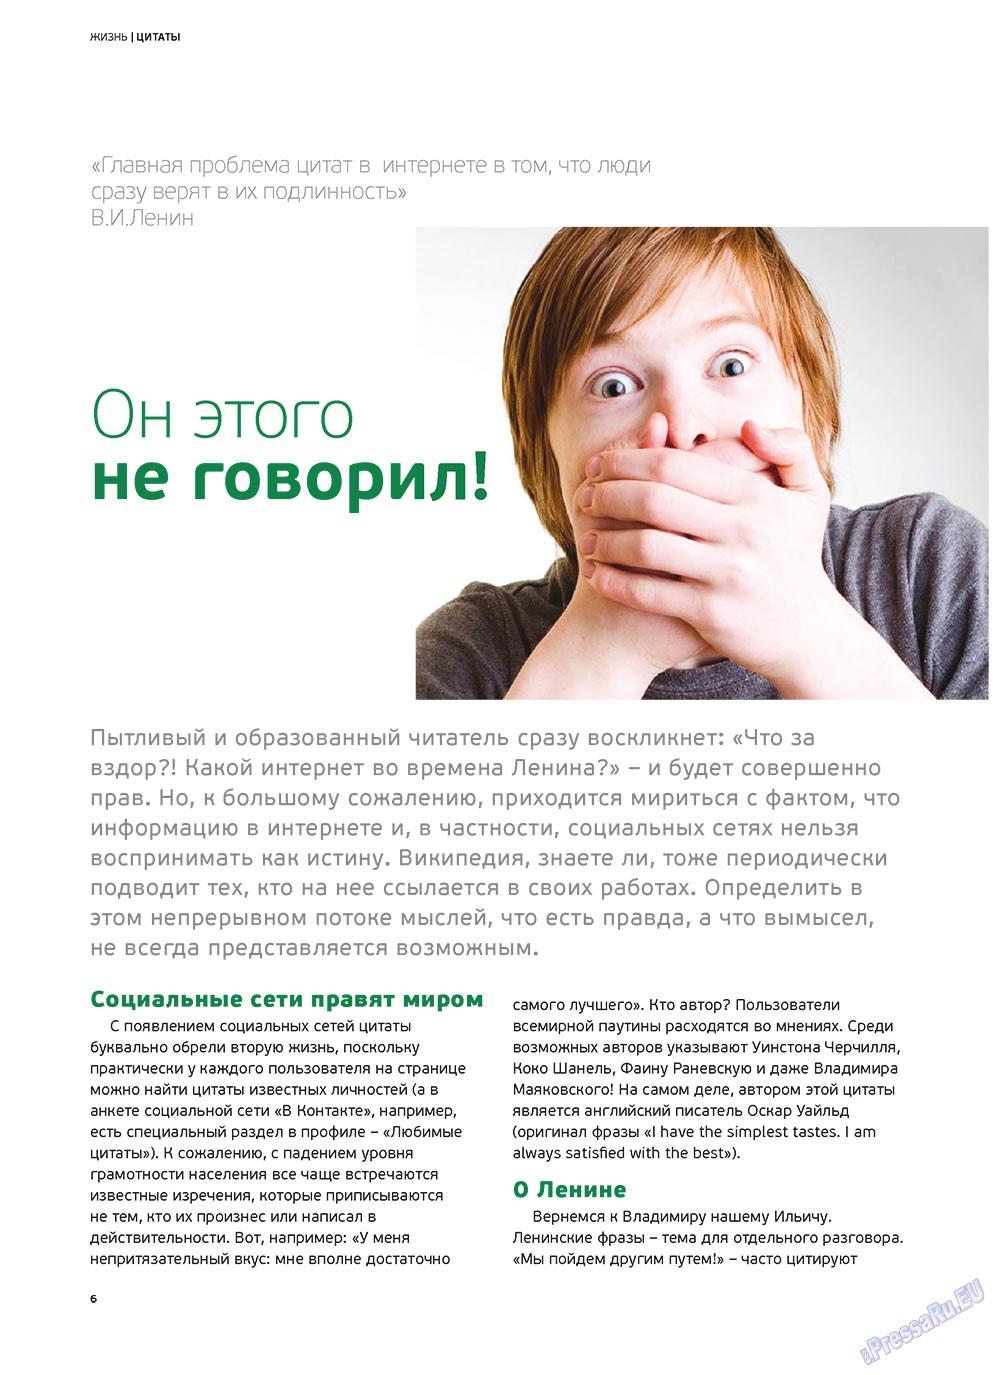 Артек (журнал). 2012 год, номер 1, стр. 8